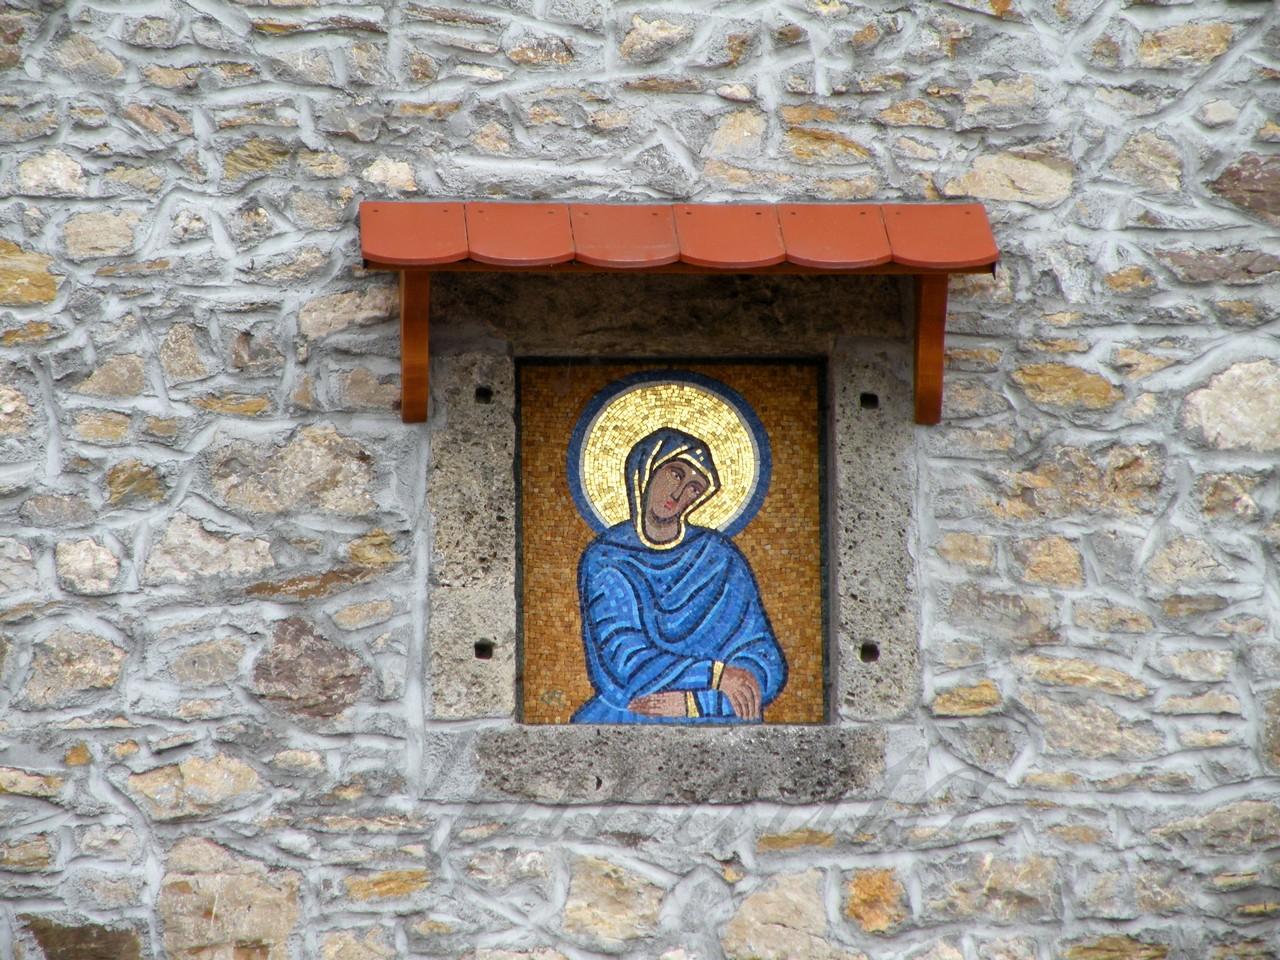 Stavoli di Orias (Prato Carnico)